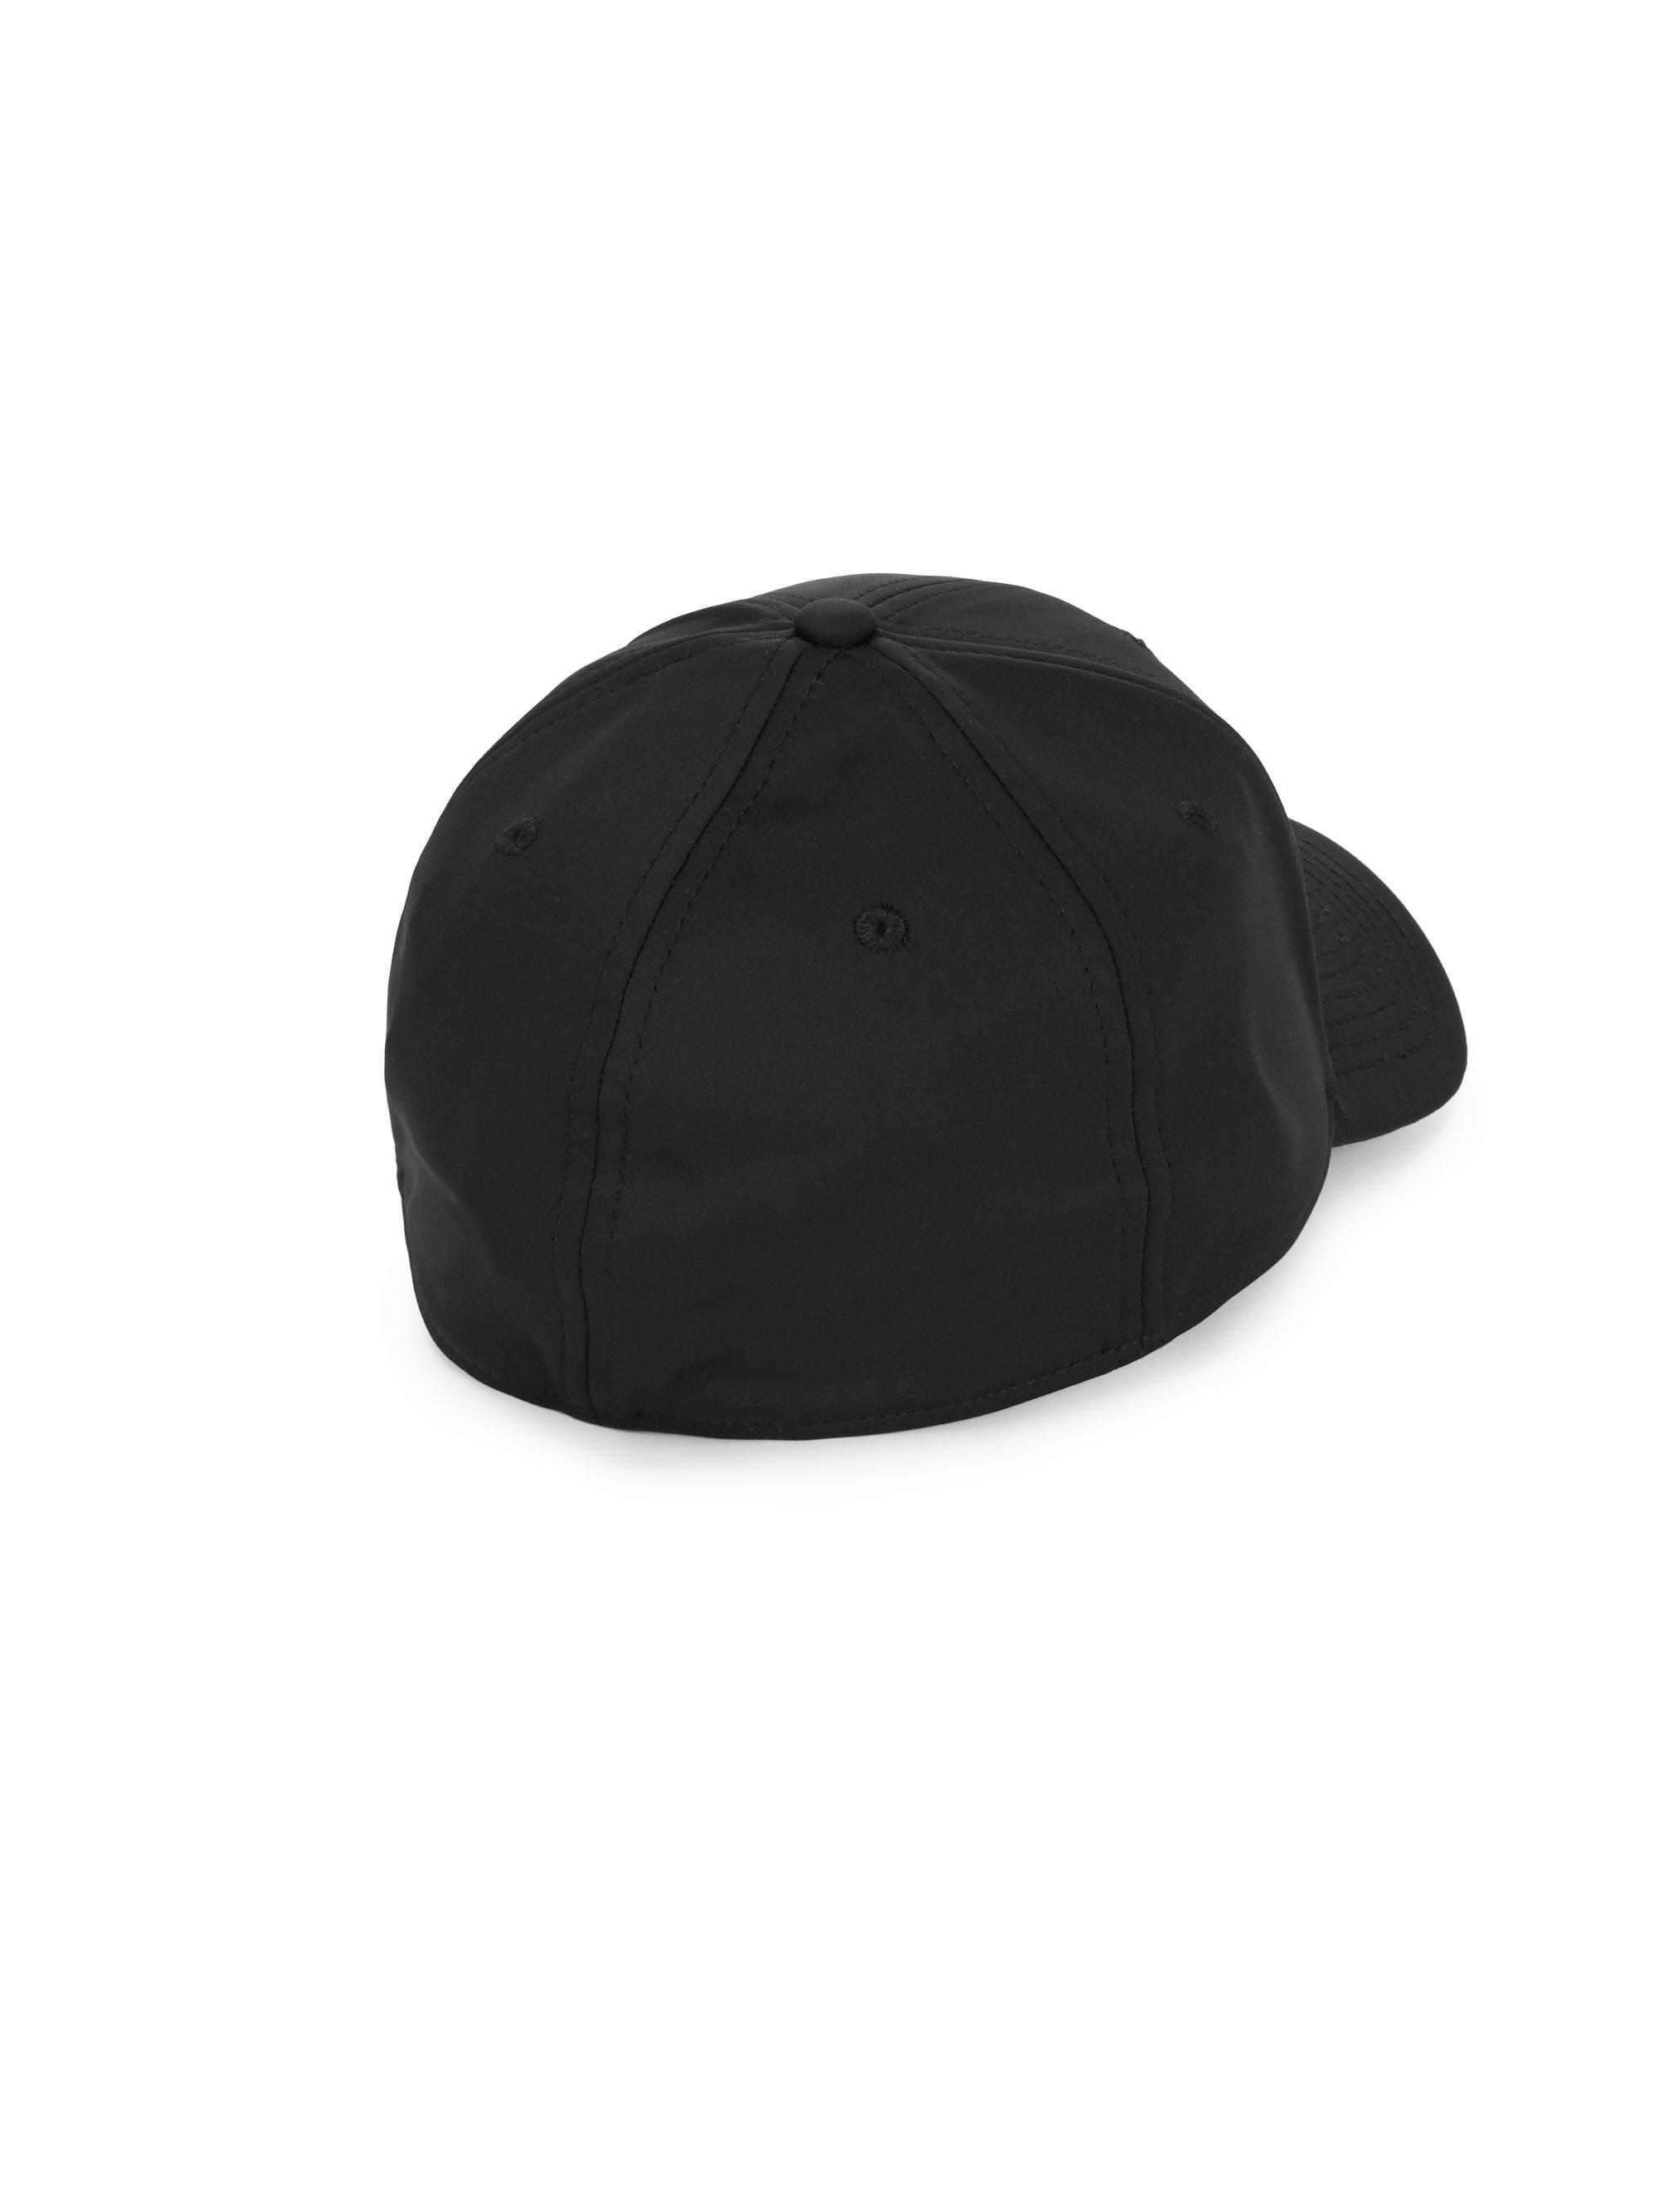 e06920eec5f Canada Goose Tech Logo Baseball Cap in Black for Men - Lyst